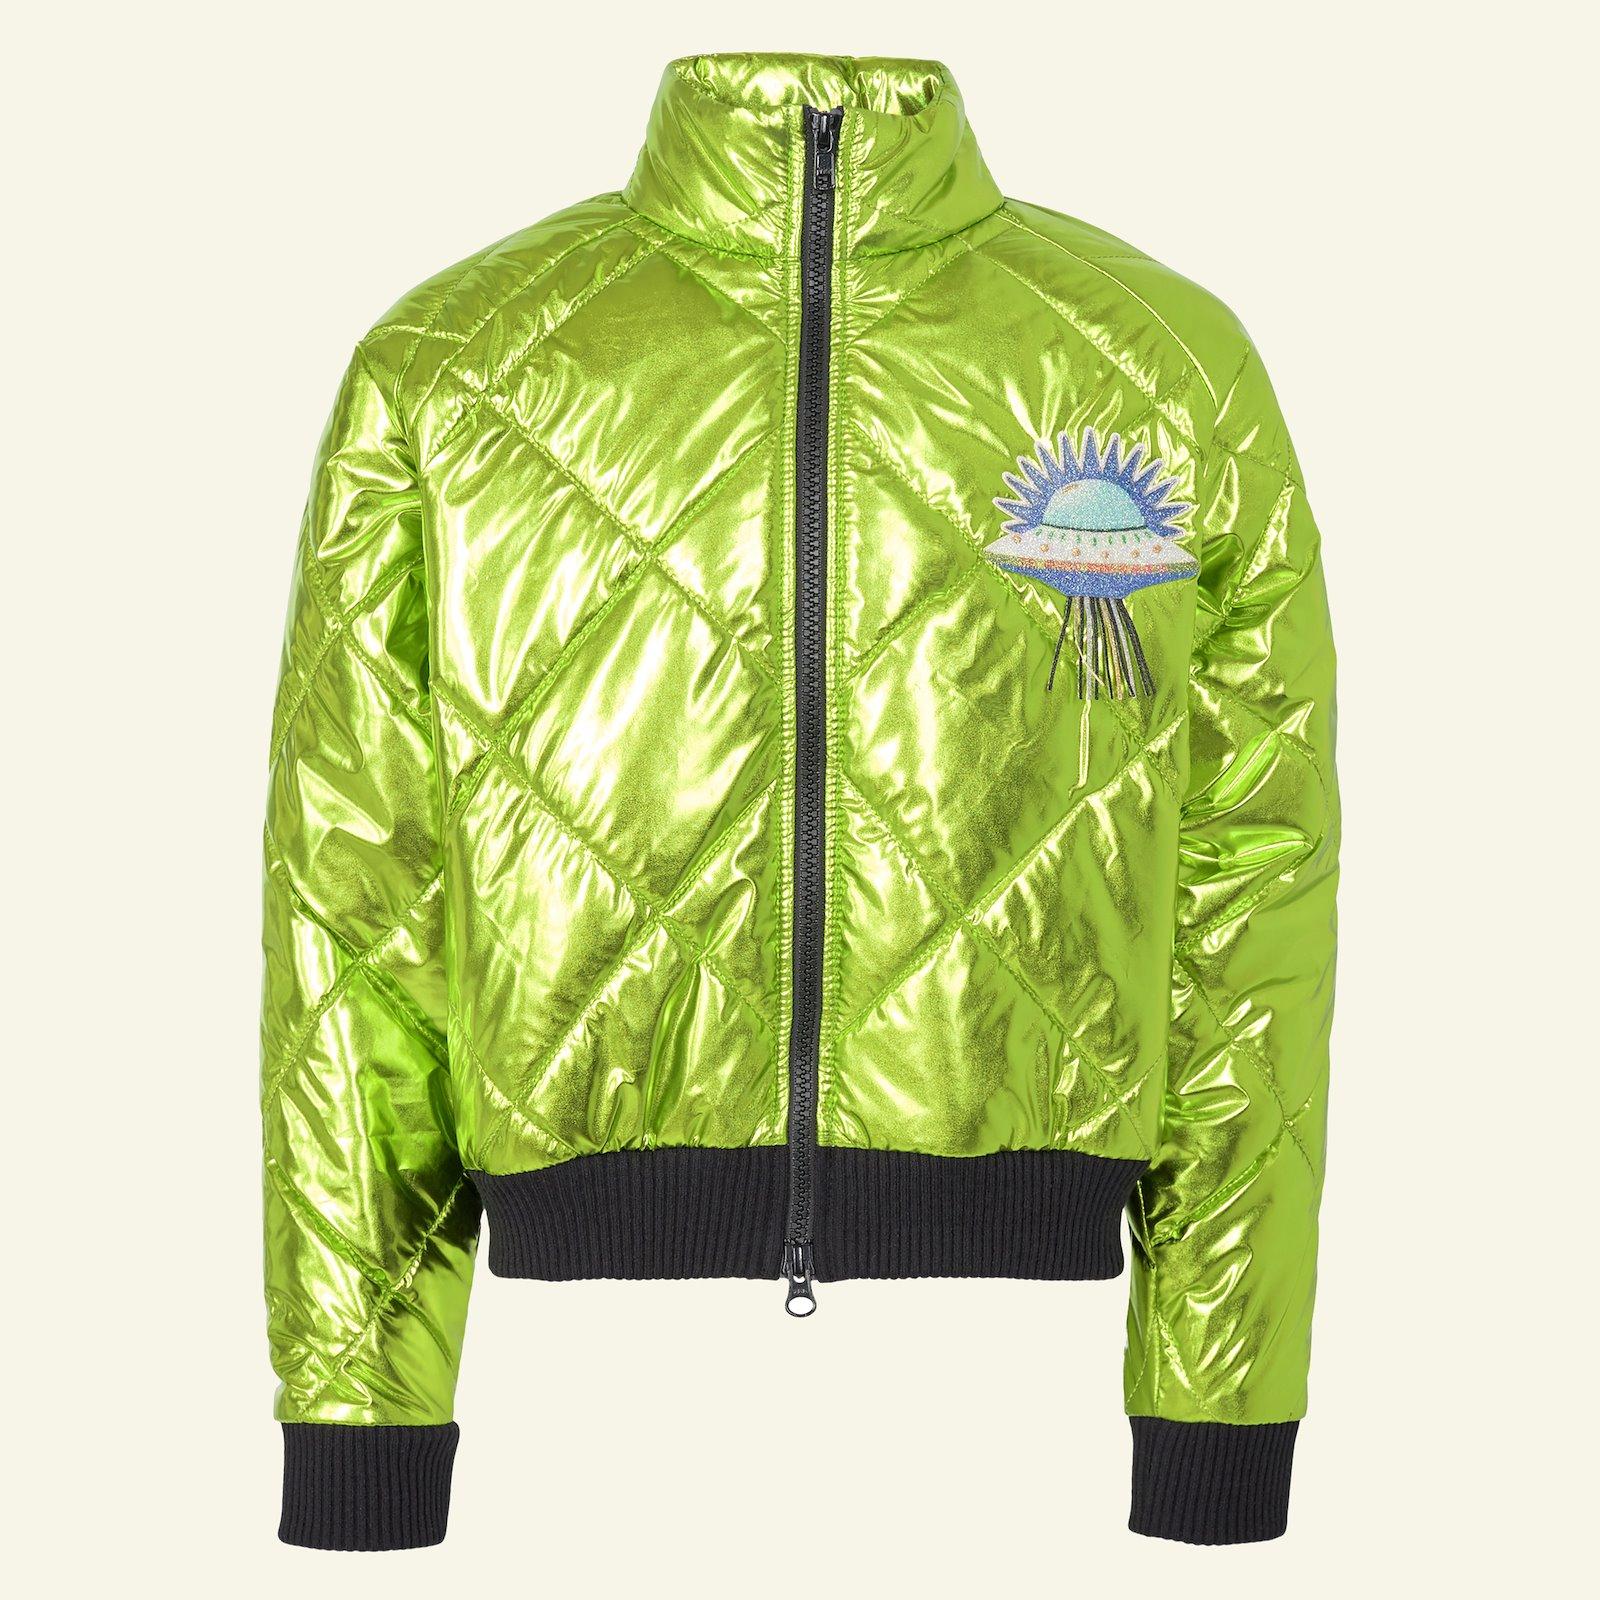 Anorak and jacket, 128/8y p64020_920221_96077_26464_sskit